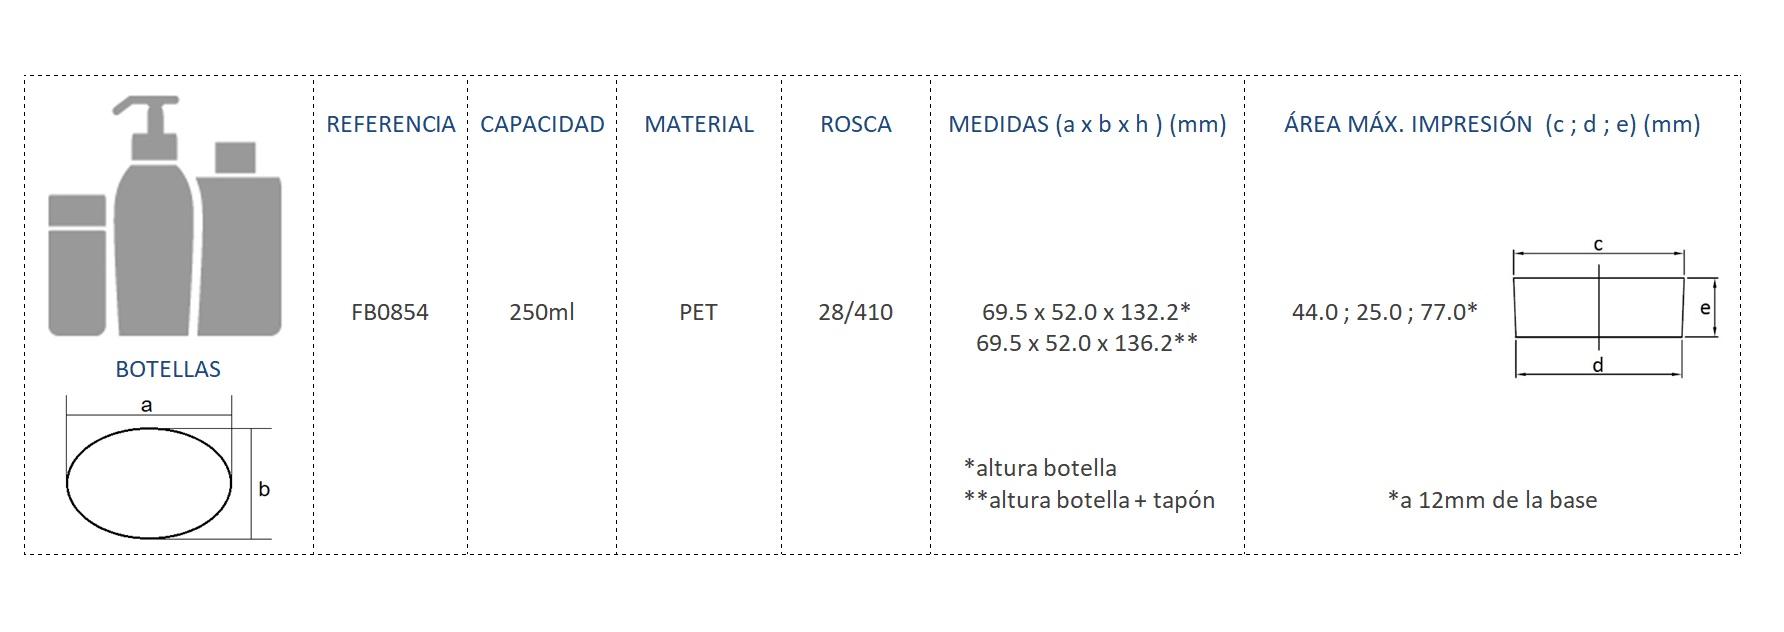 Cuadro de materiales botella FB0854